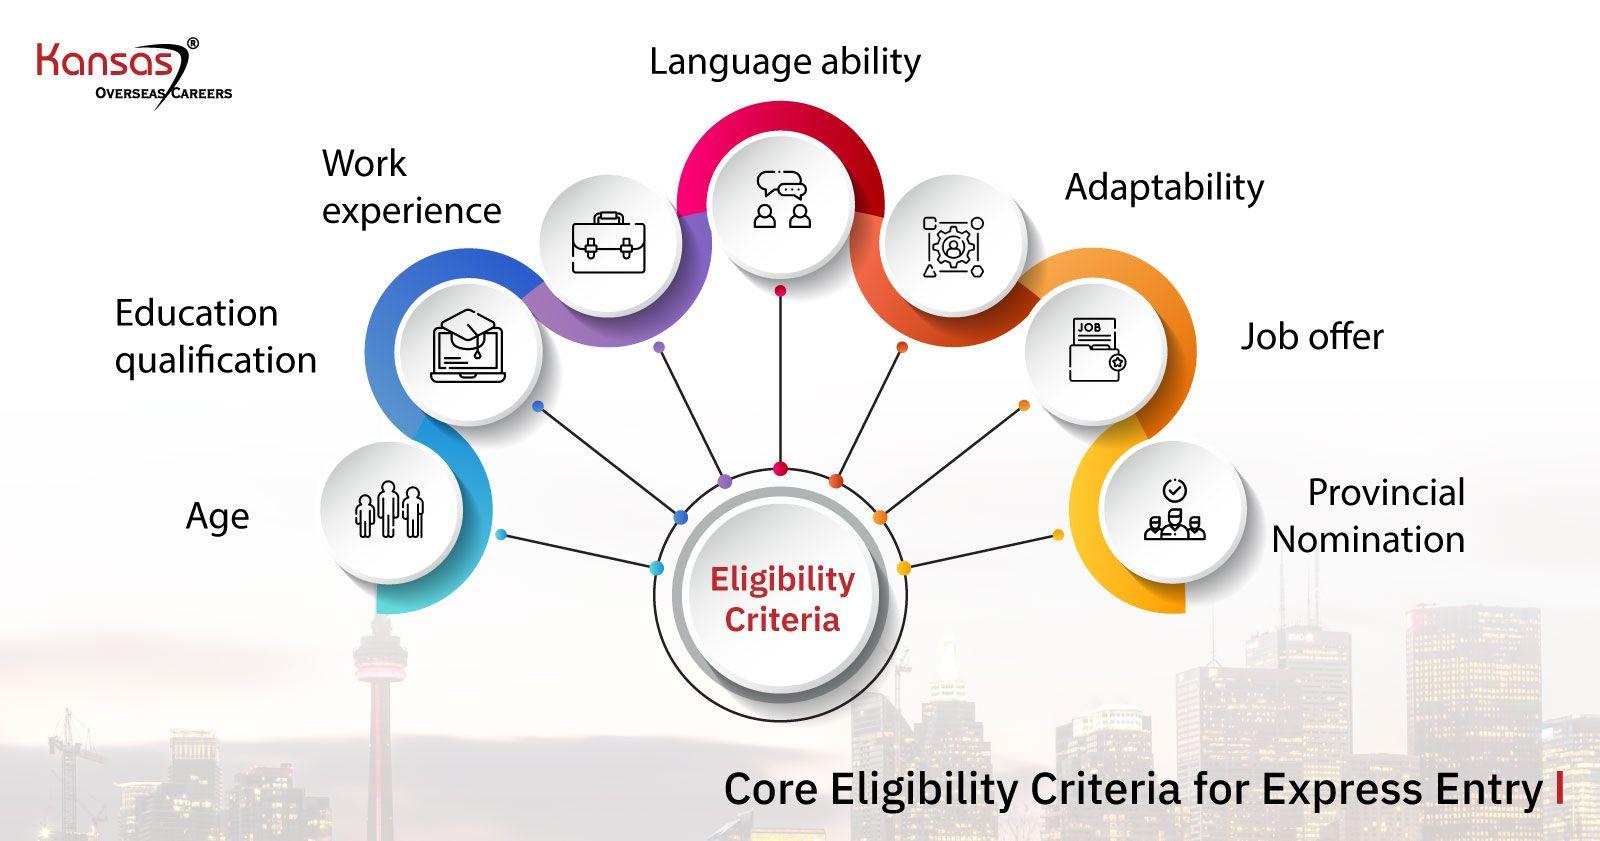 Core-Eligibility-Criteria-for-Express-Entry